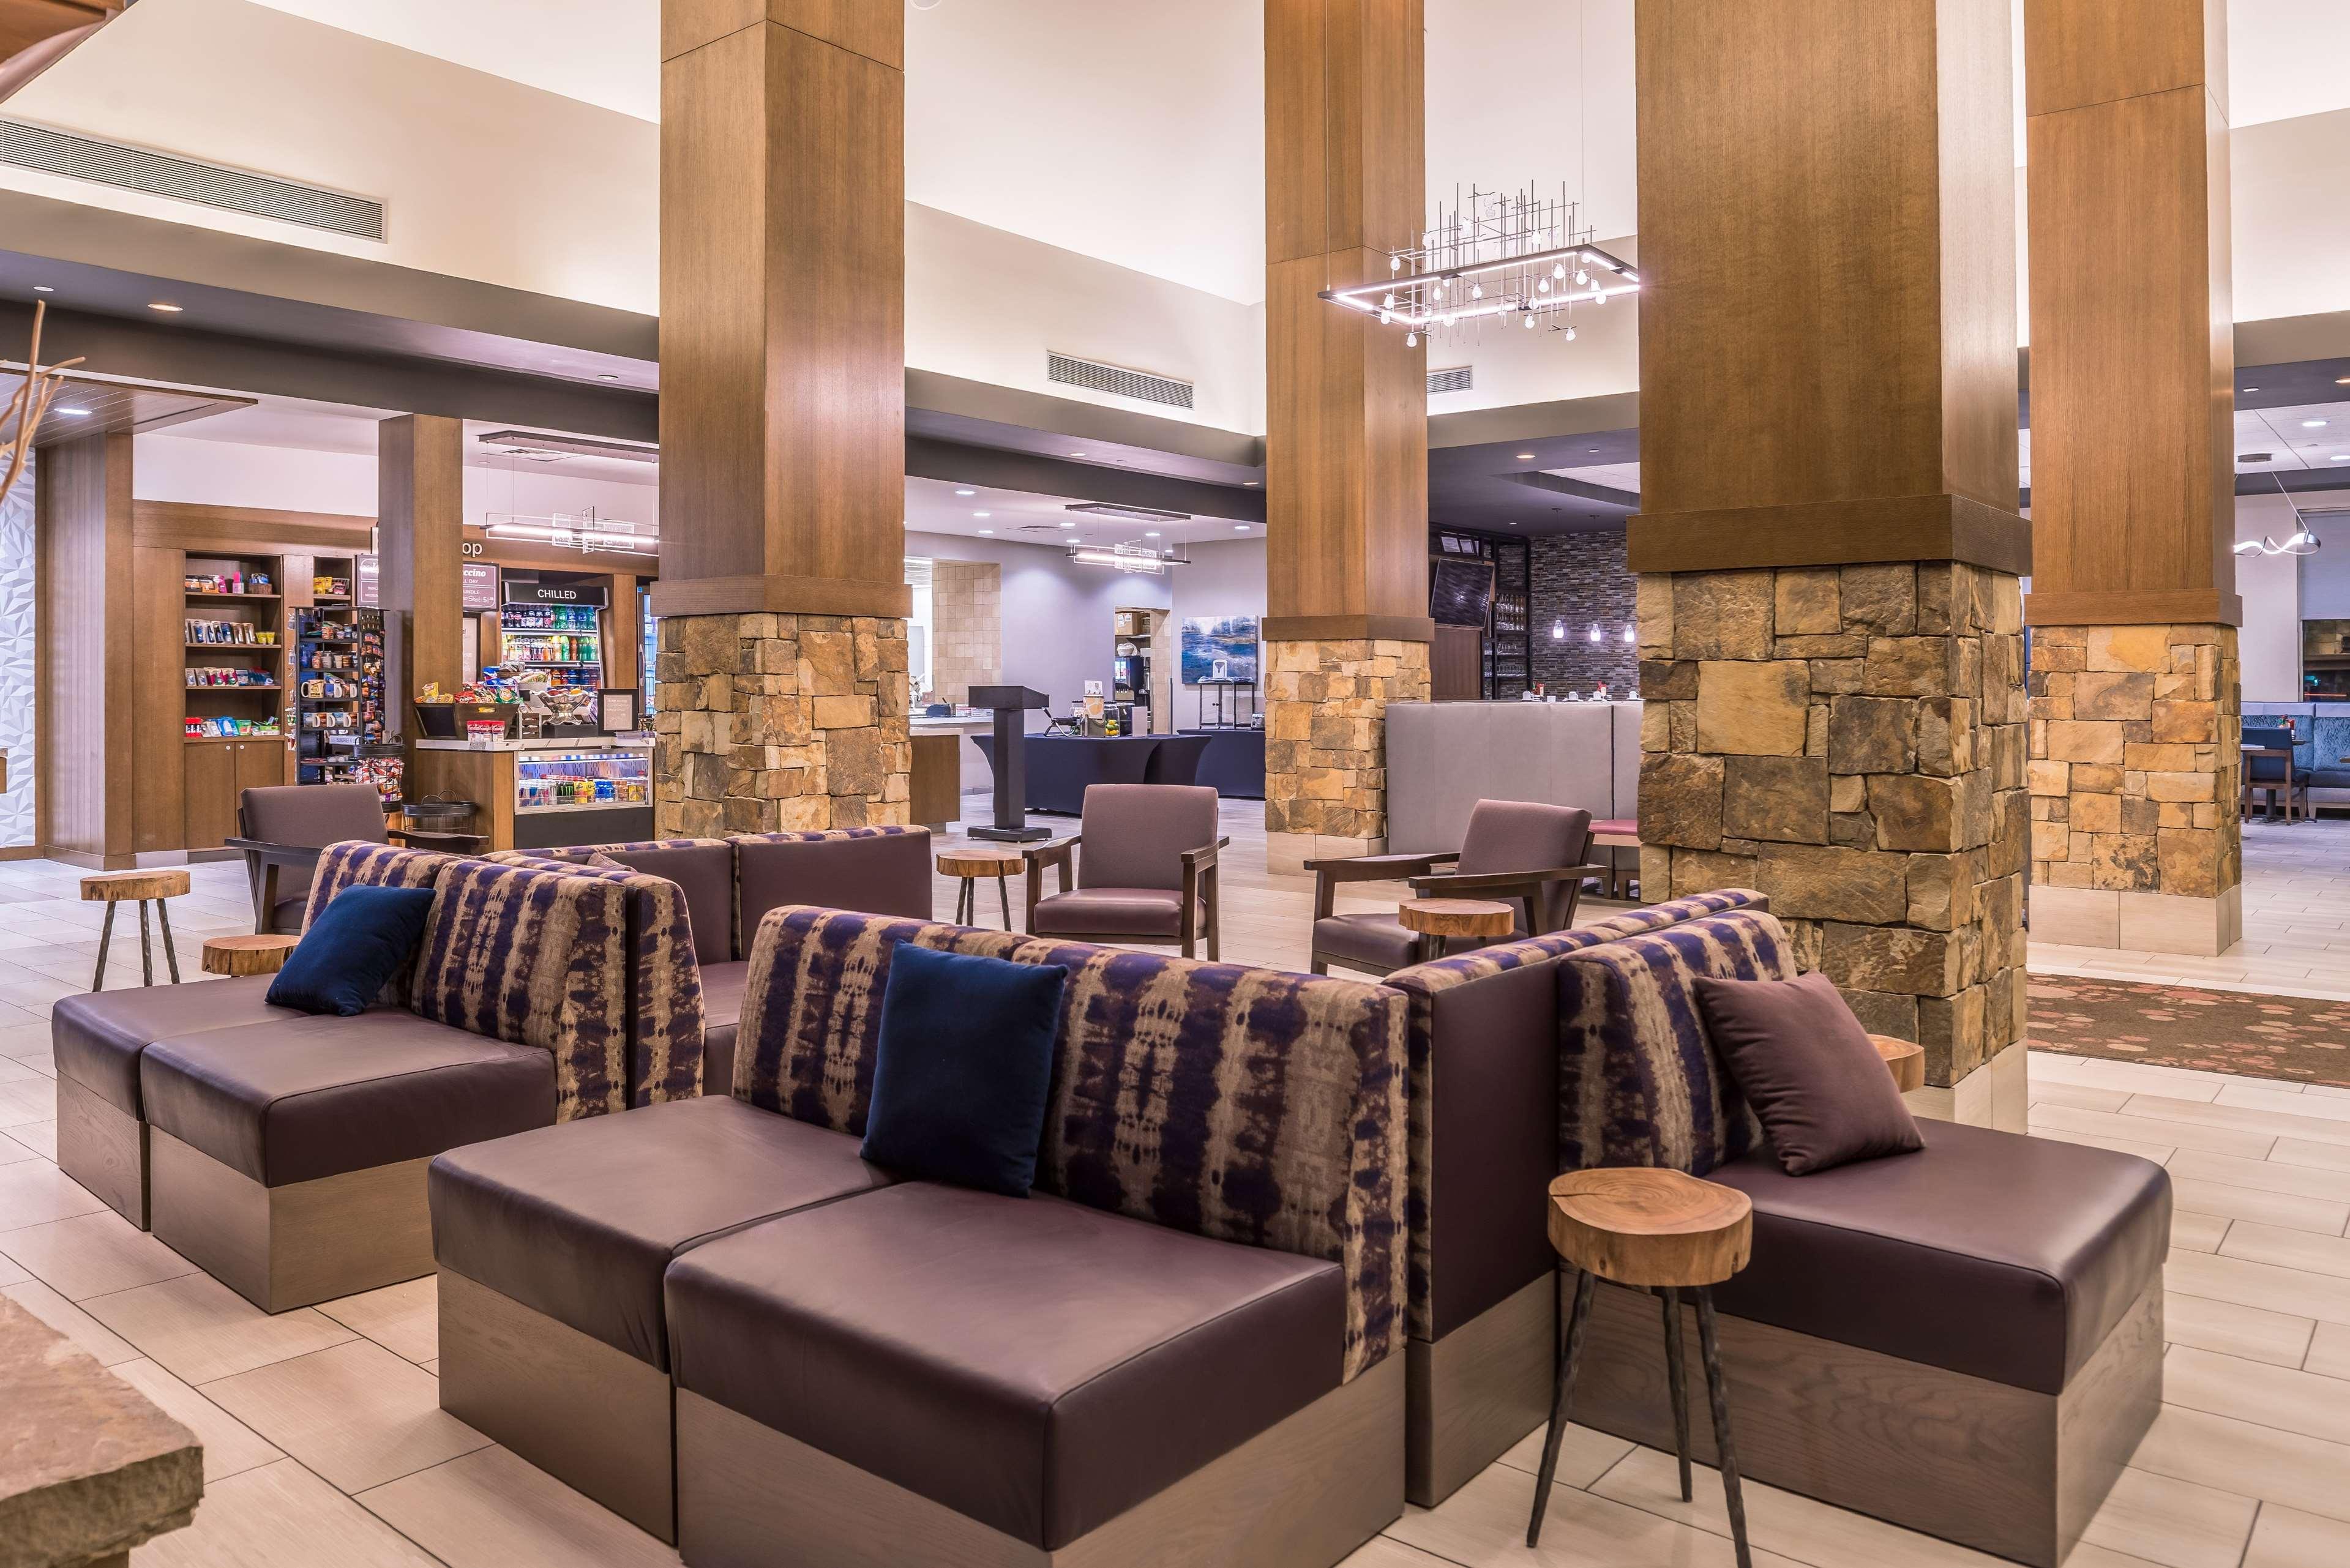 Hilton Garden Inn Salt Lake City Downtown image 10